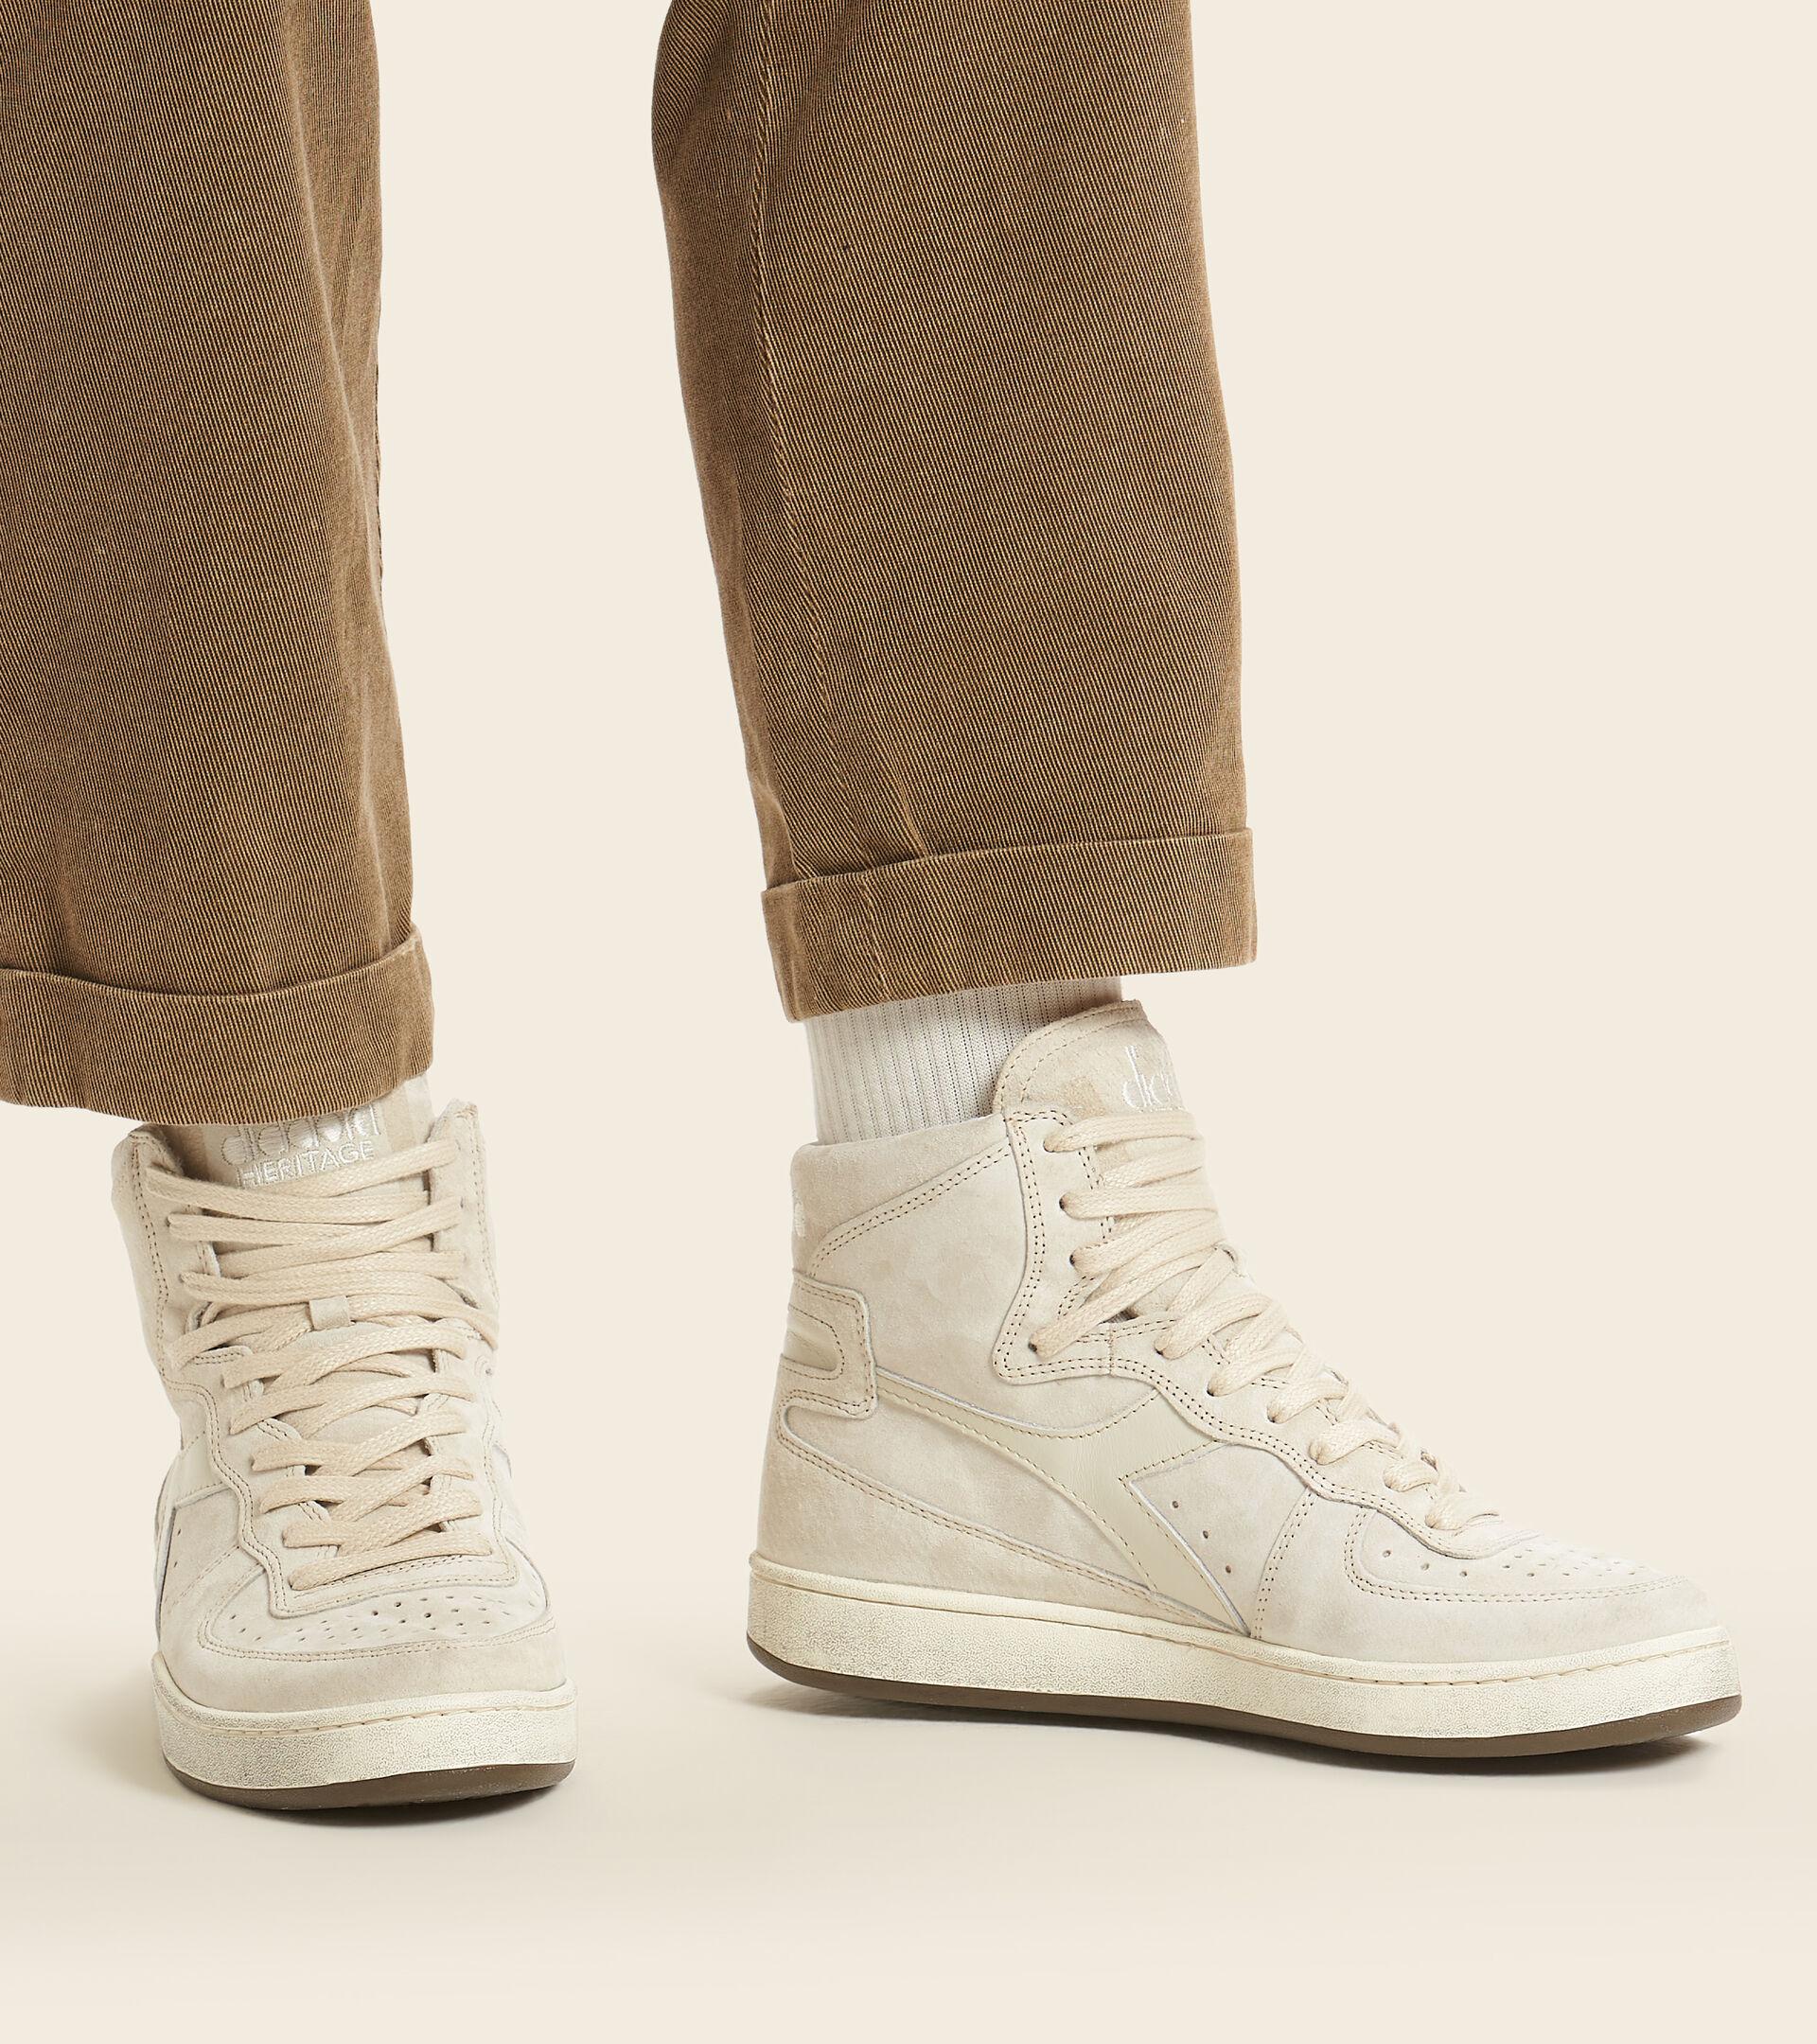 Footwear Heritage UNISEX MI BASKET SUEDE USED BEIGE FOG Diadora